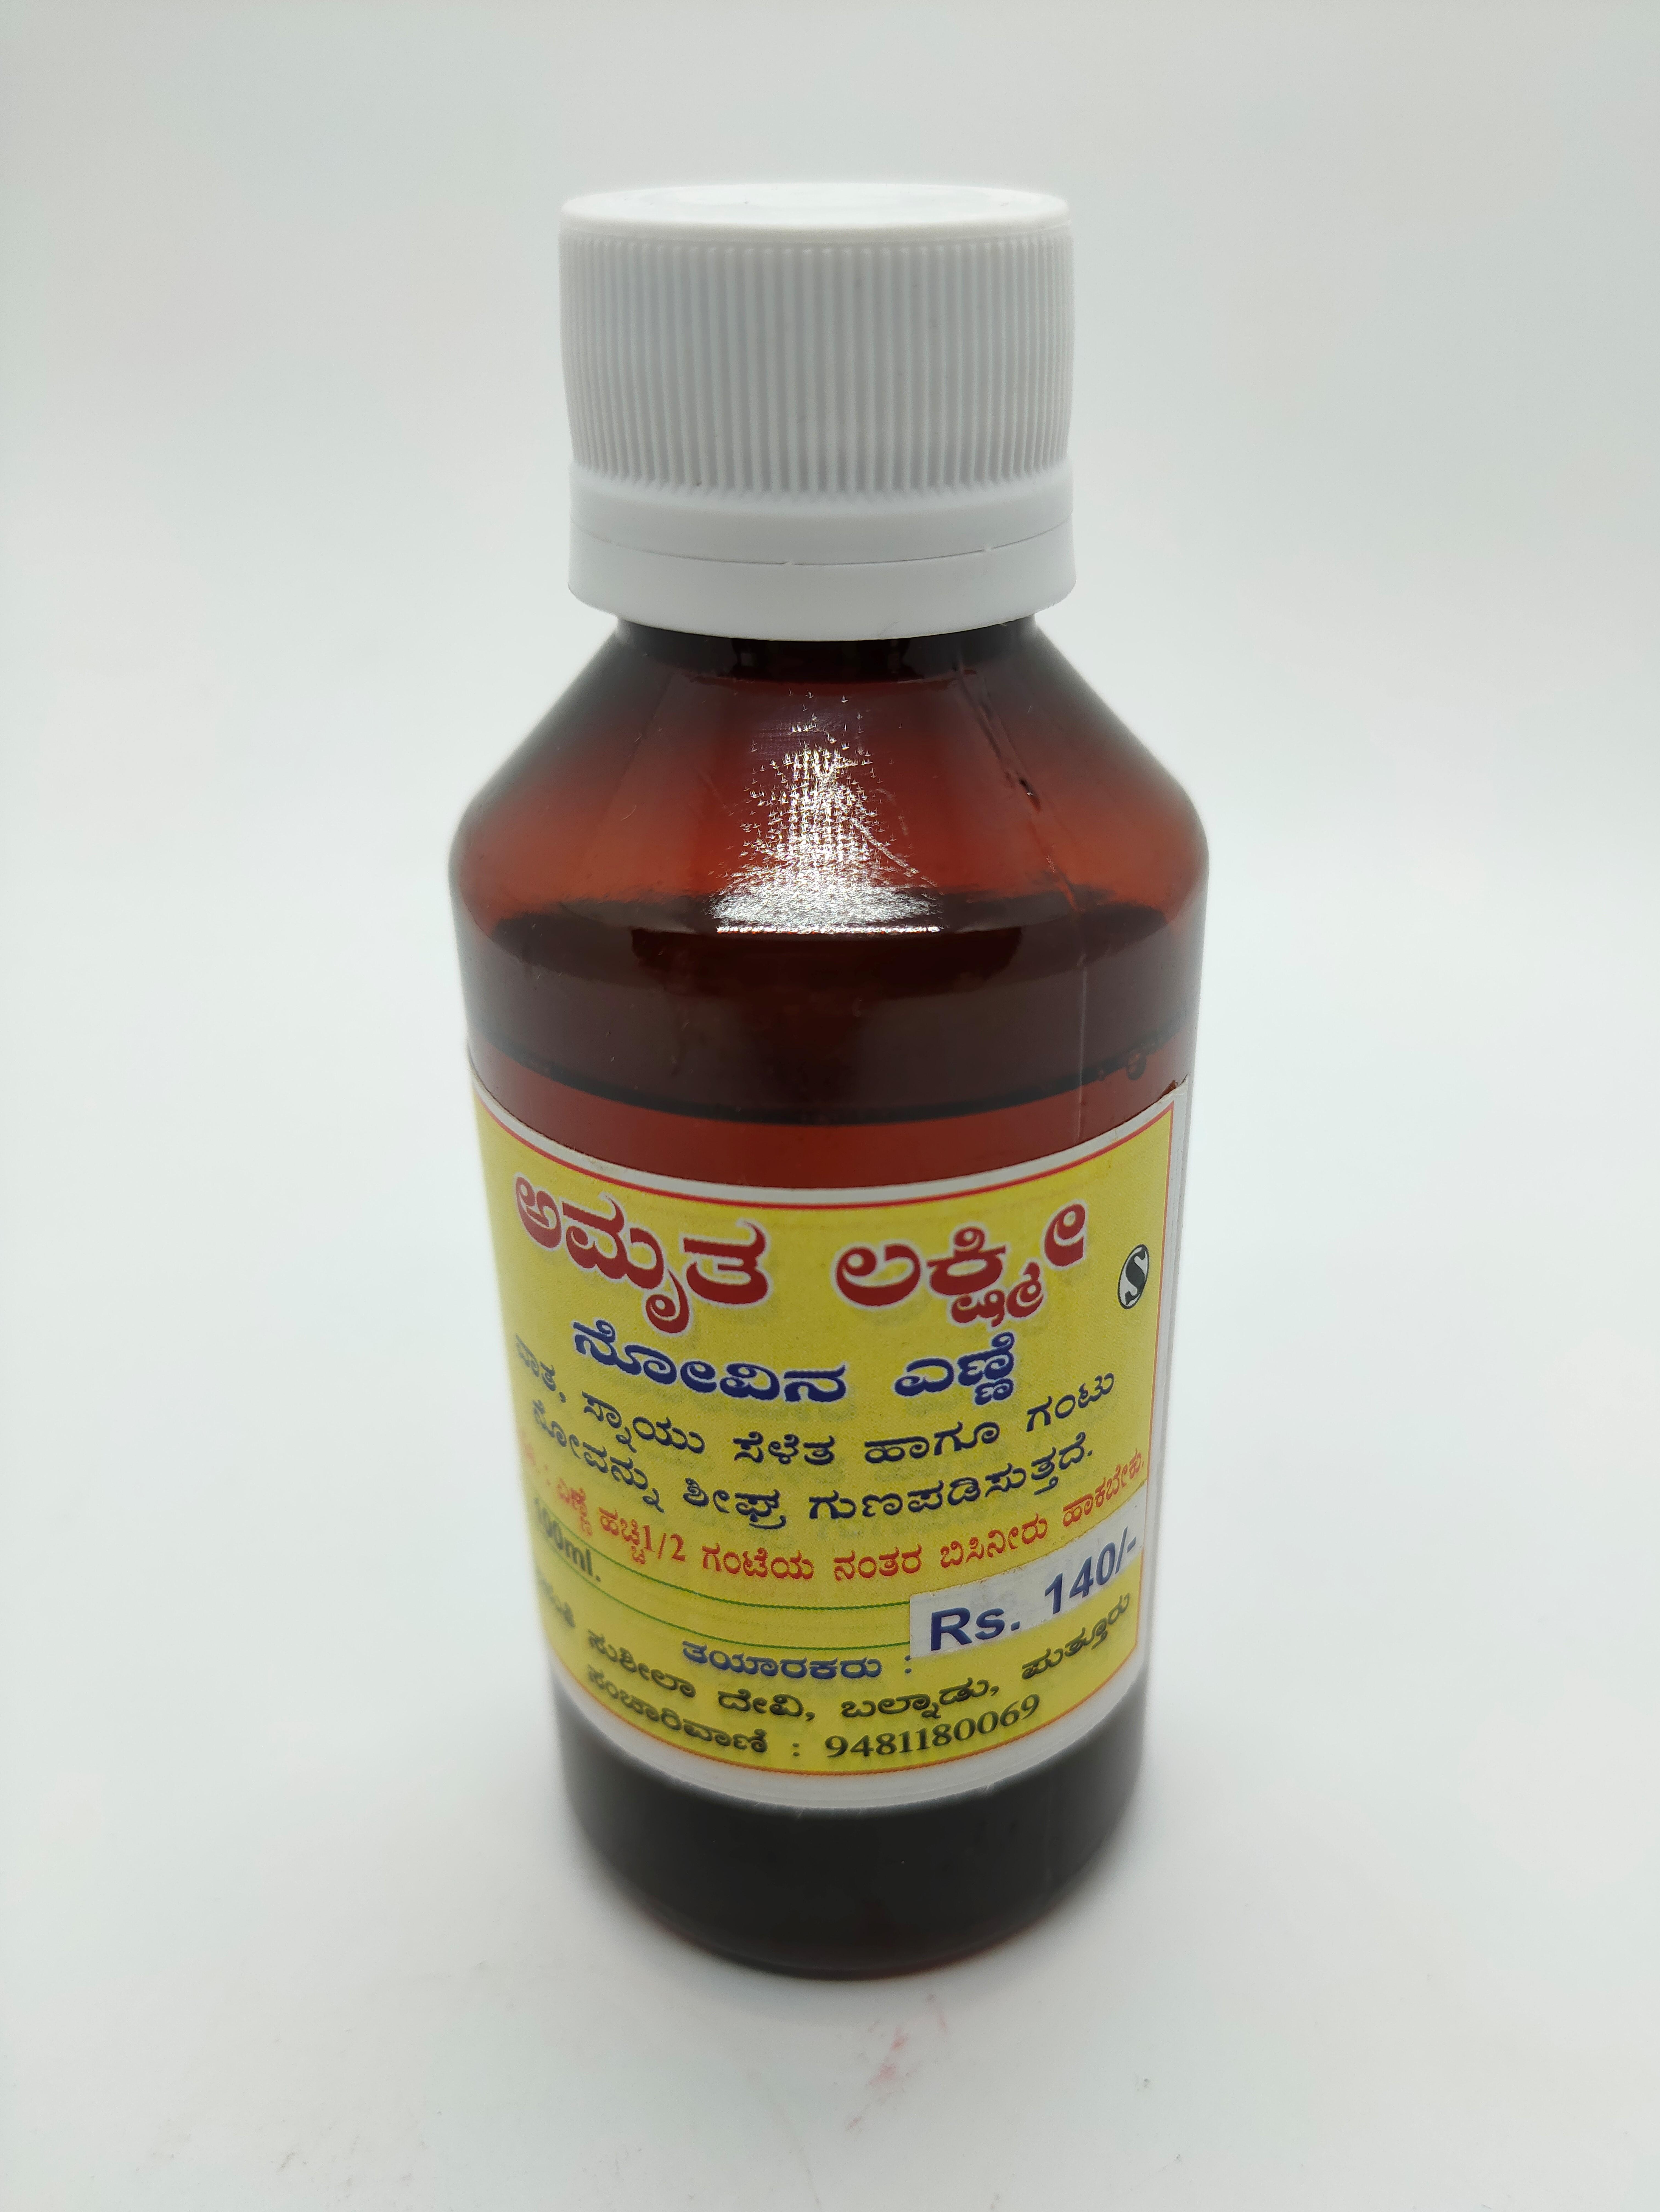 Amritha laxmi Pain Oil 100Ml